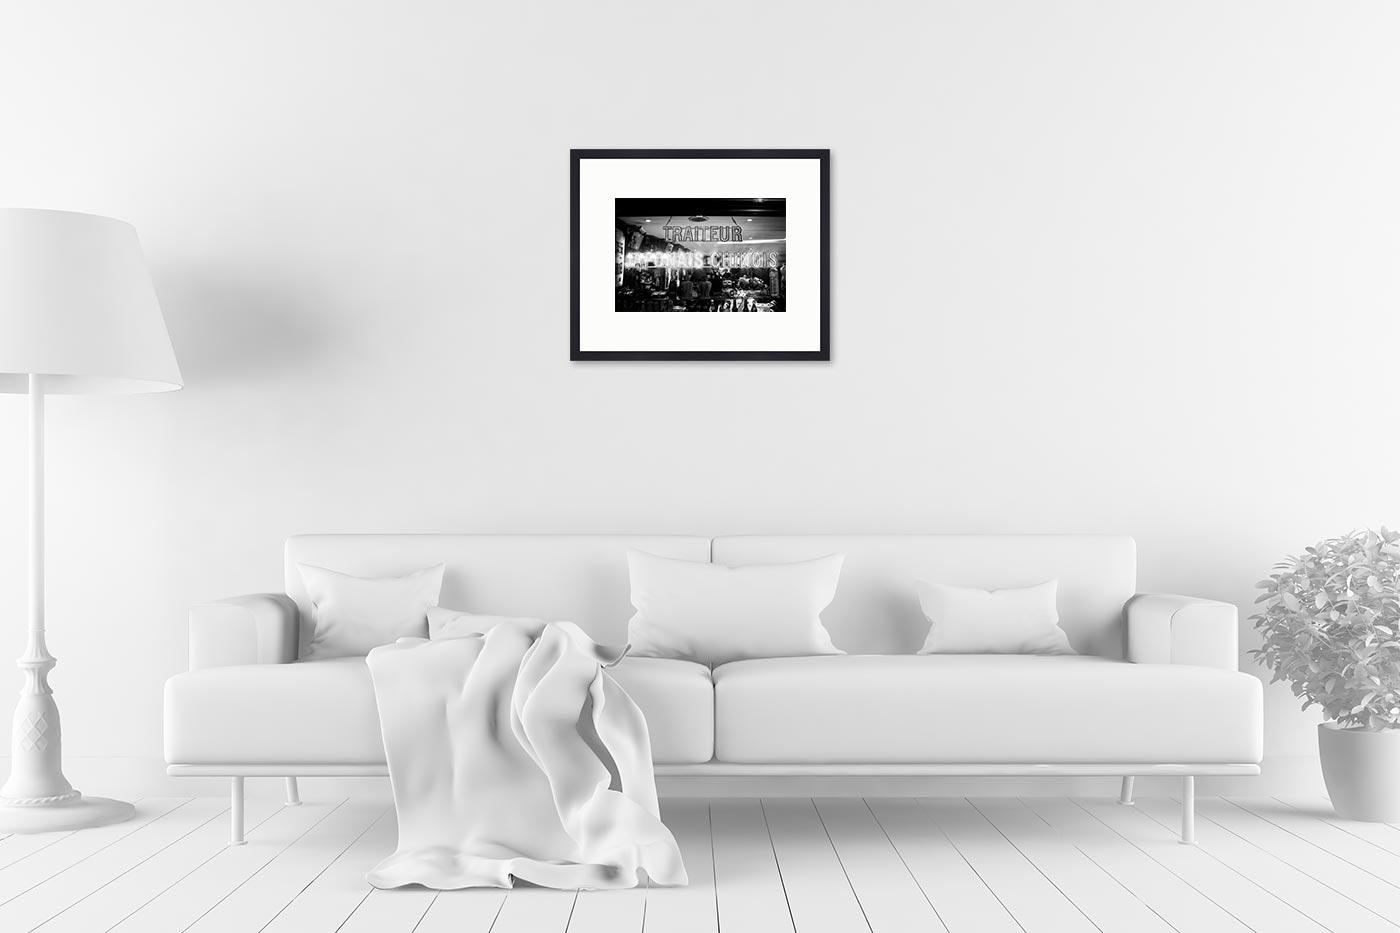 Cadre galerie 40x50 Takeaway